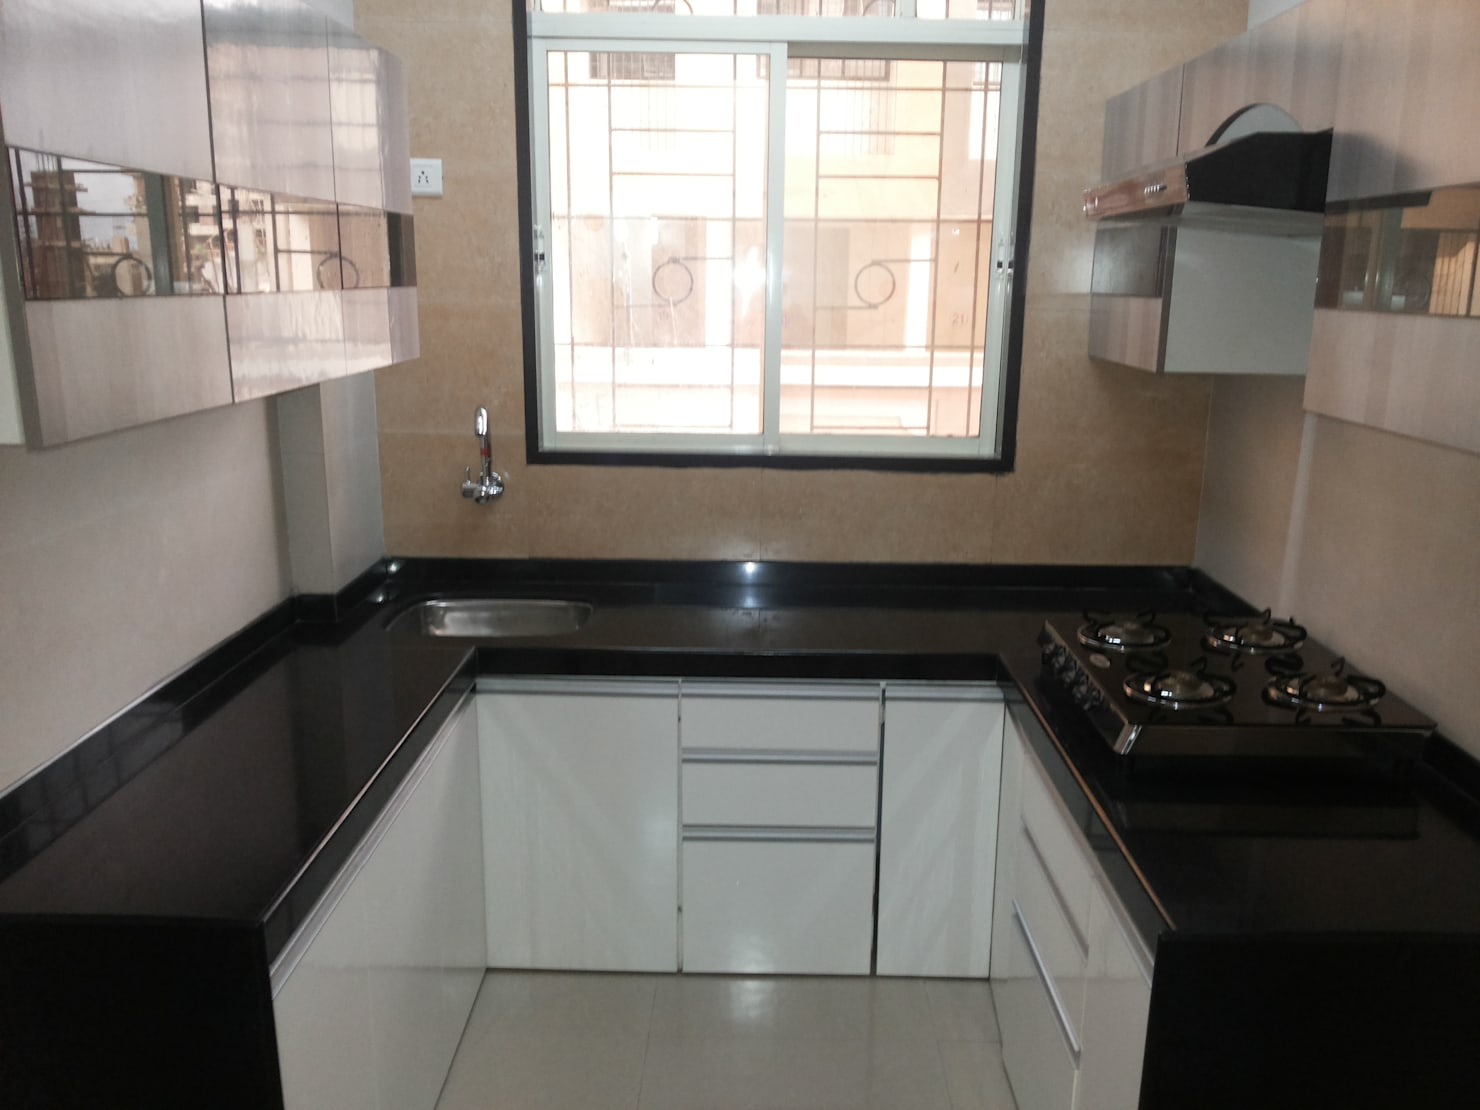 Modular kitchen design idea from a Mumbai home